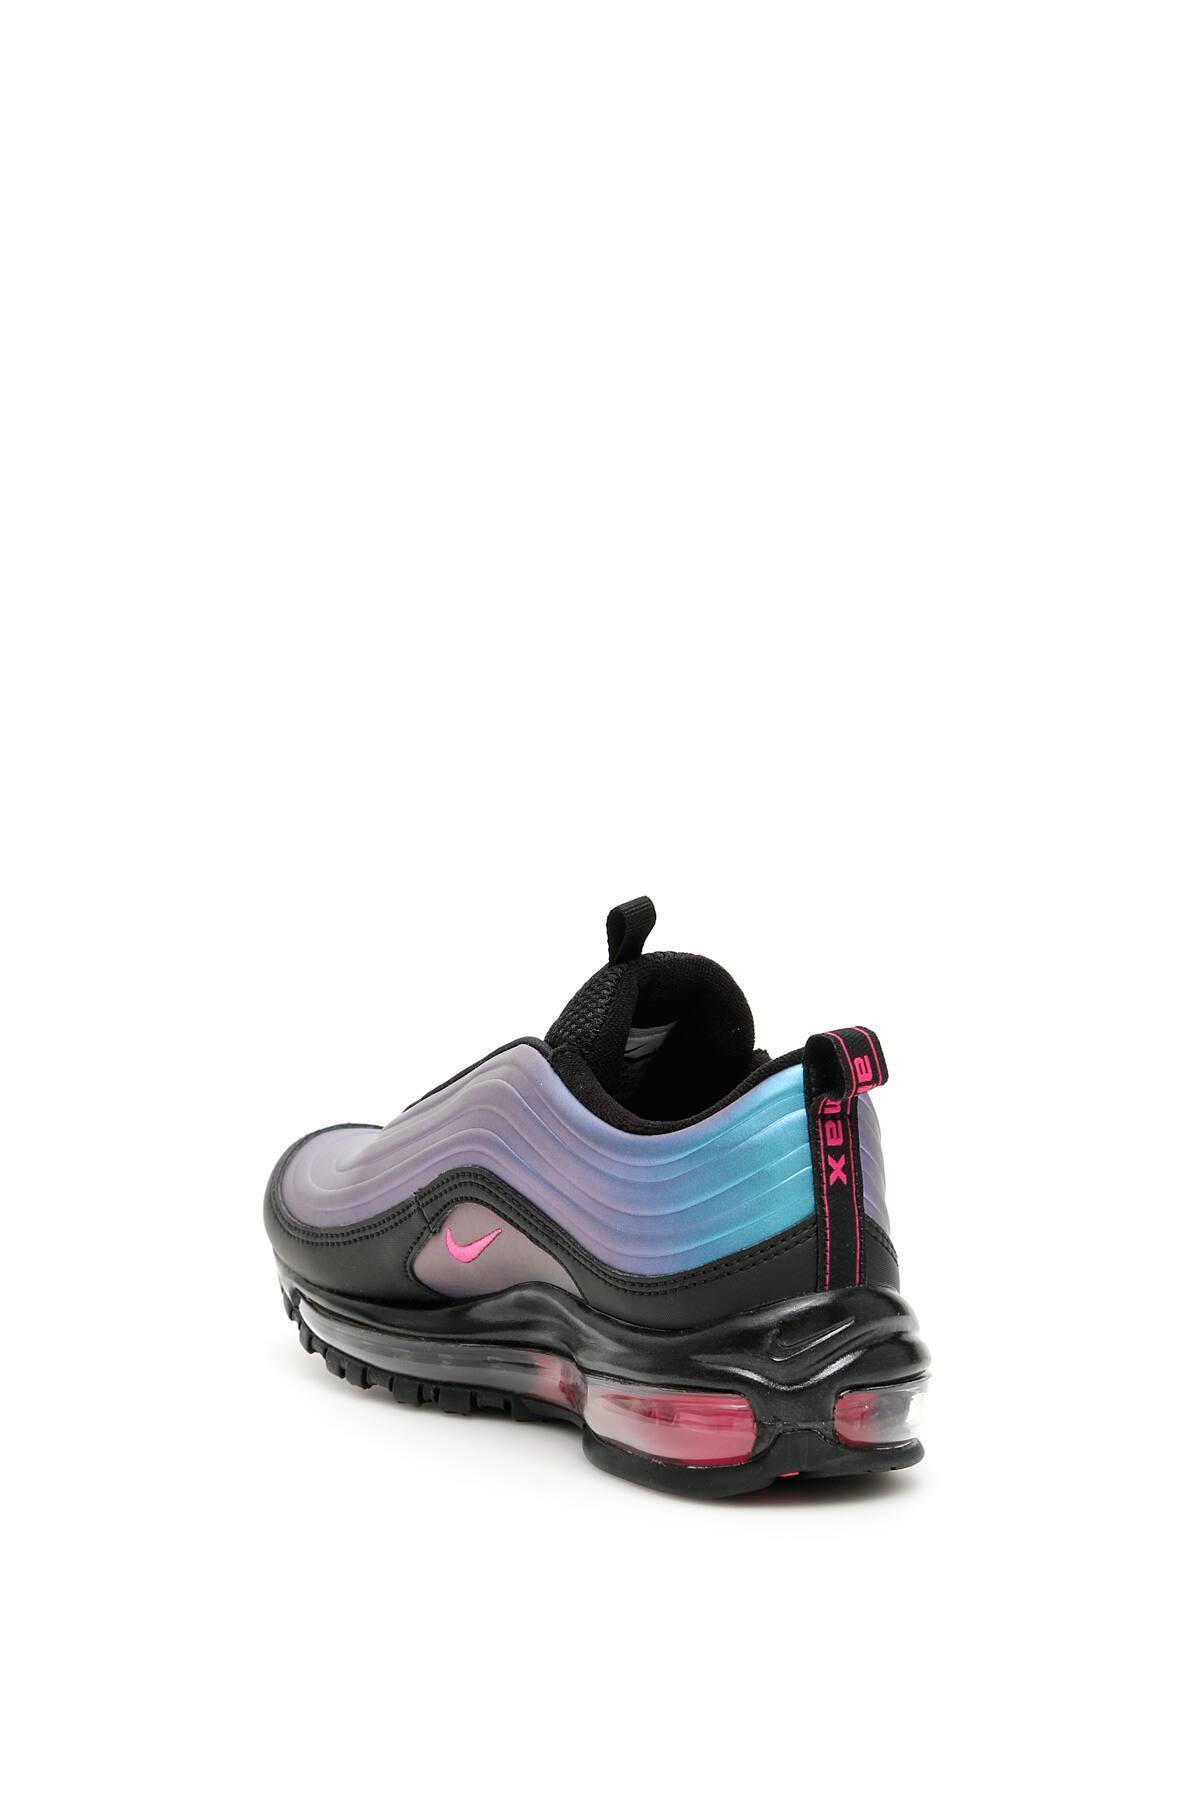 air max 97 blue and pink